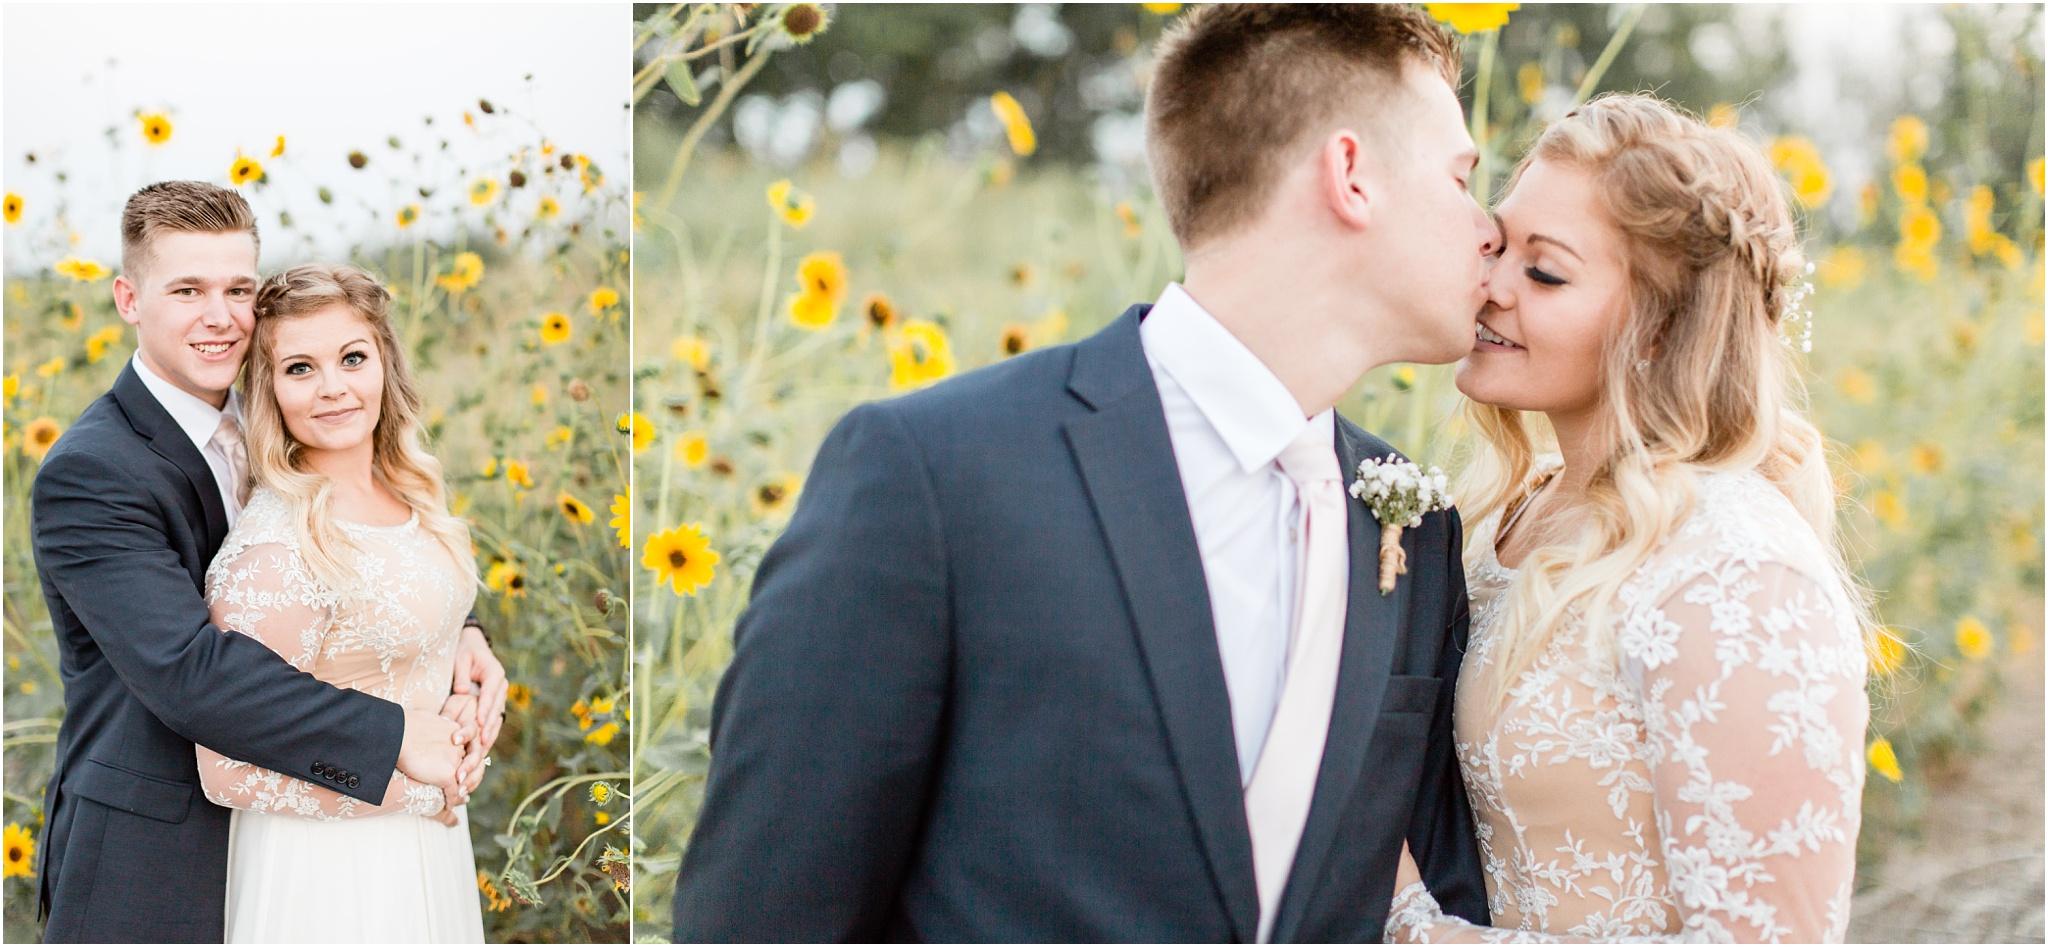 Wedding Photography_Meridian Idaho Temple_Boise Idaho_Nampa Idaho_Leah Southwick Photography_0031.jpg